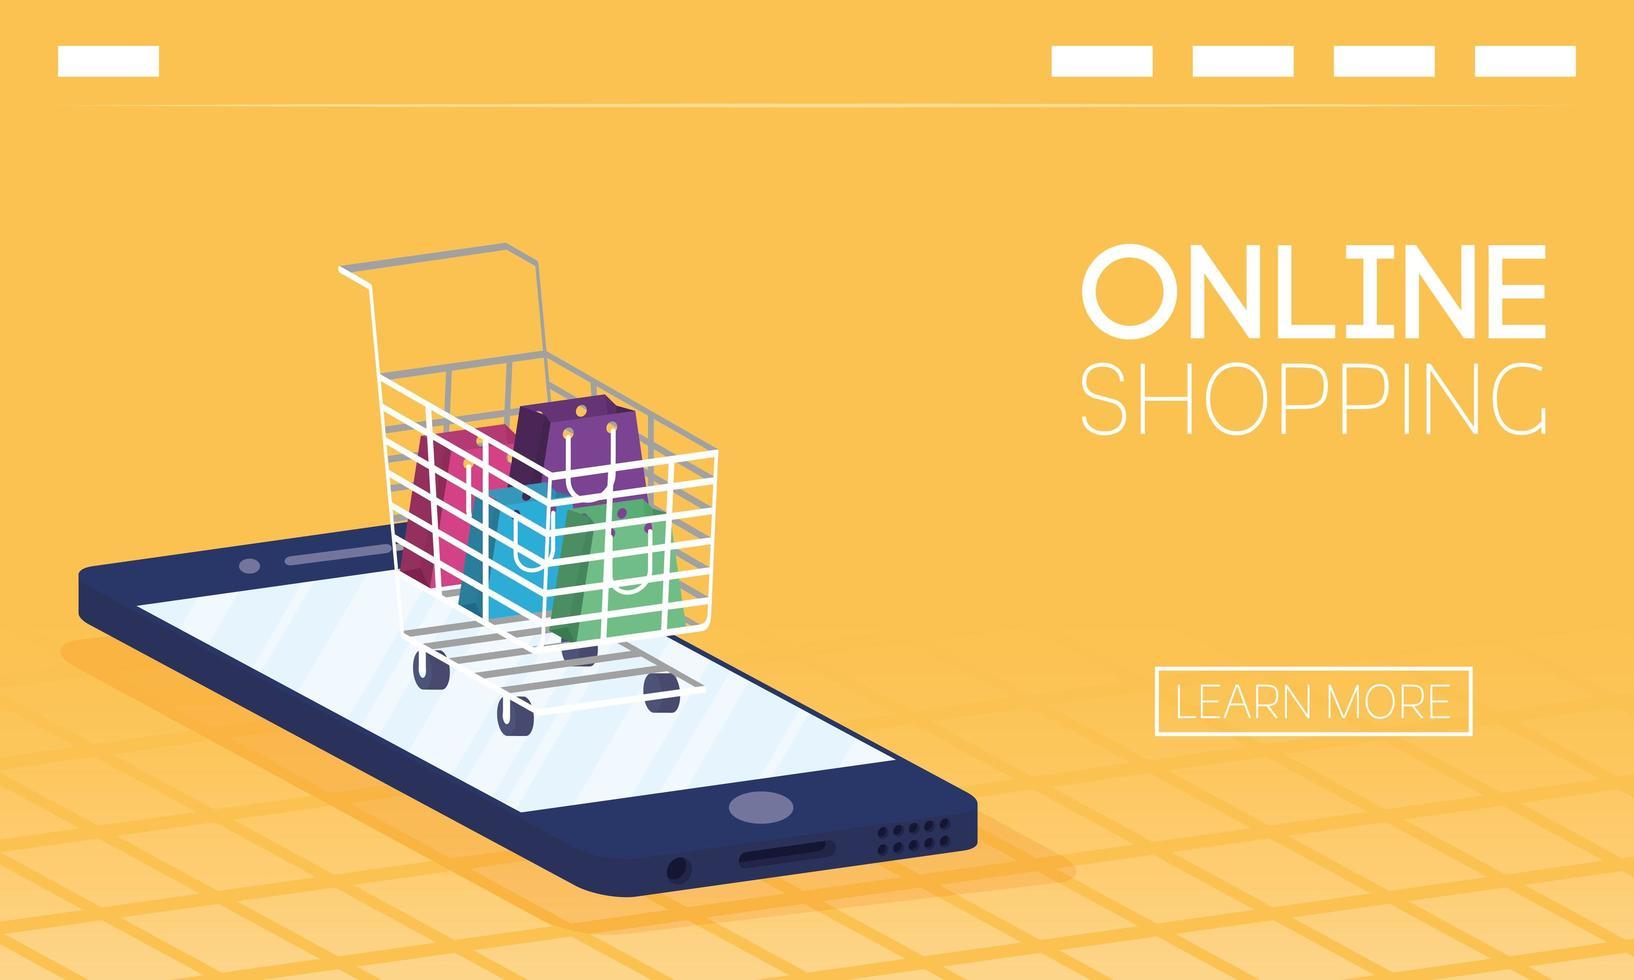 banner de compras online e e-commerce vetor